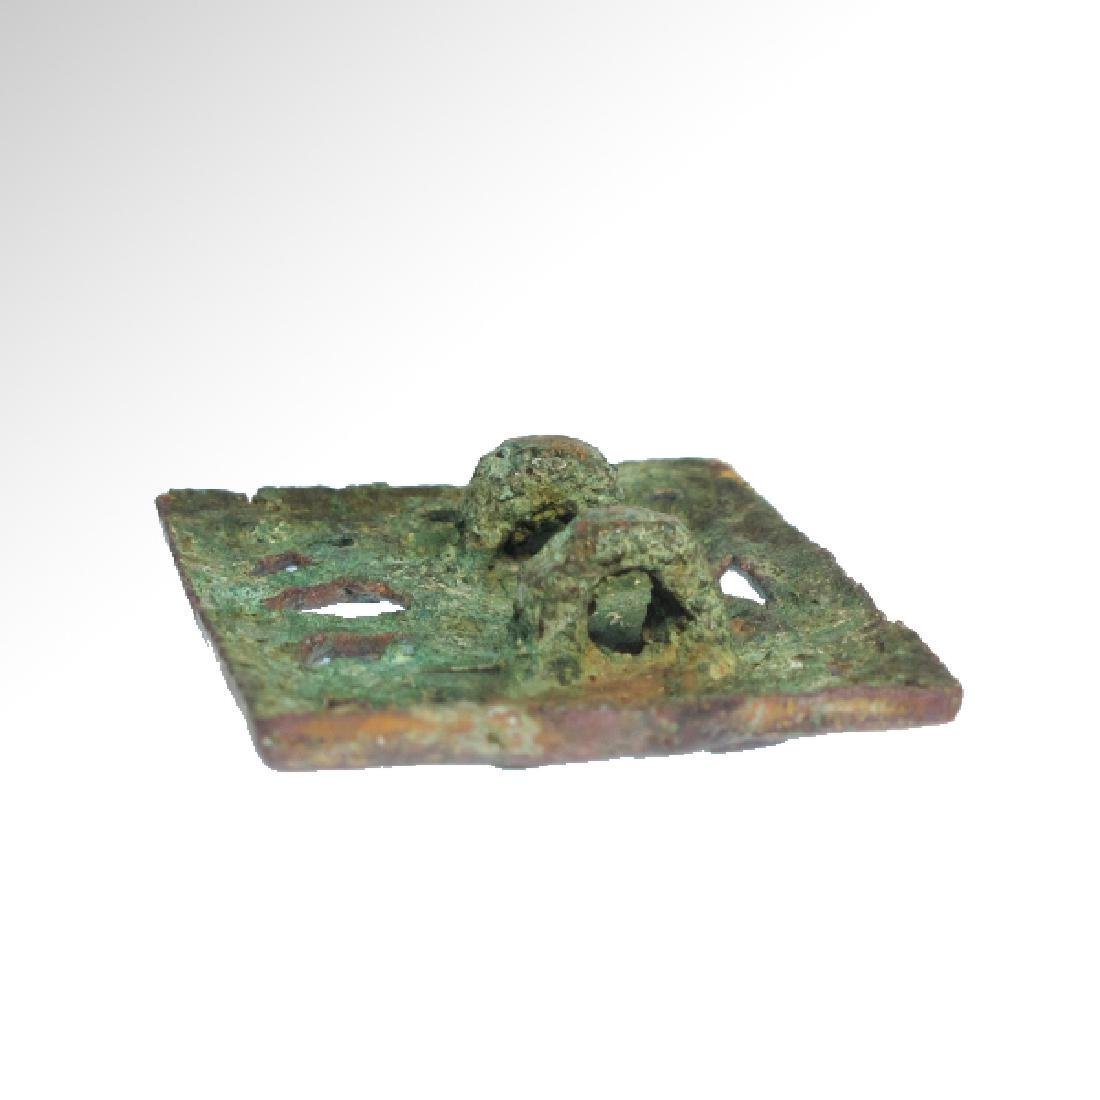 Ordos Gilt Bronze Open-Work Plaque with Bull, c. 500 - 5